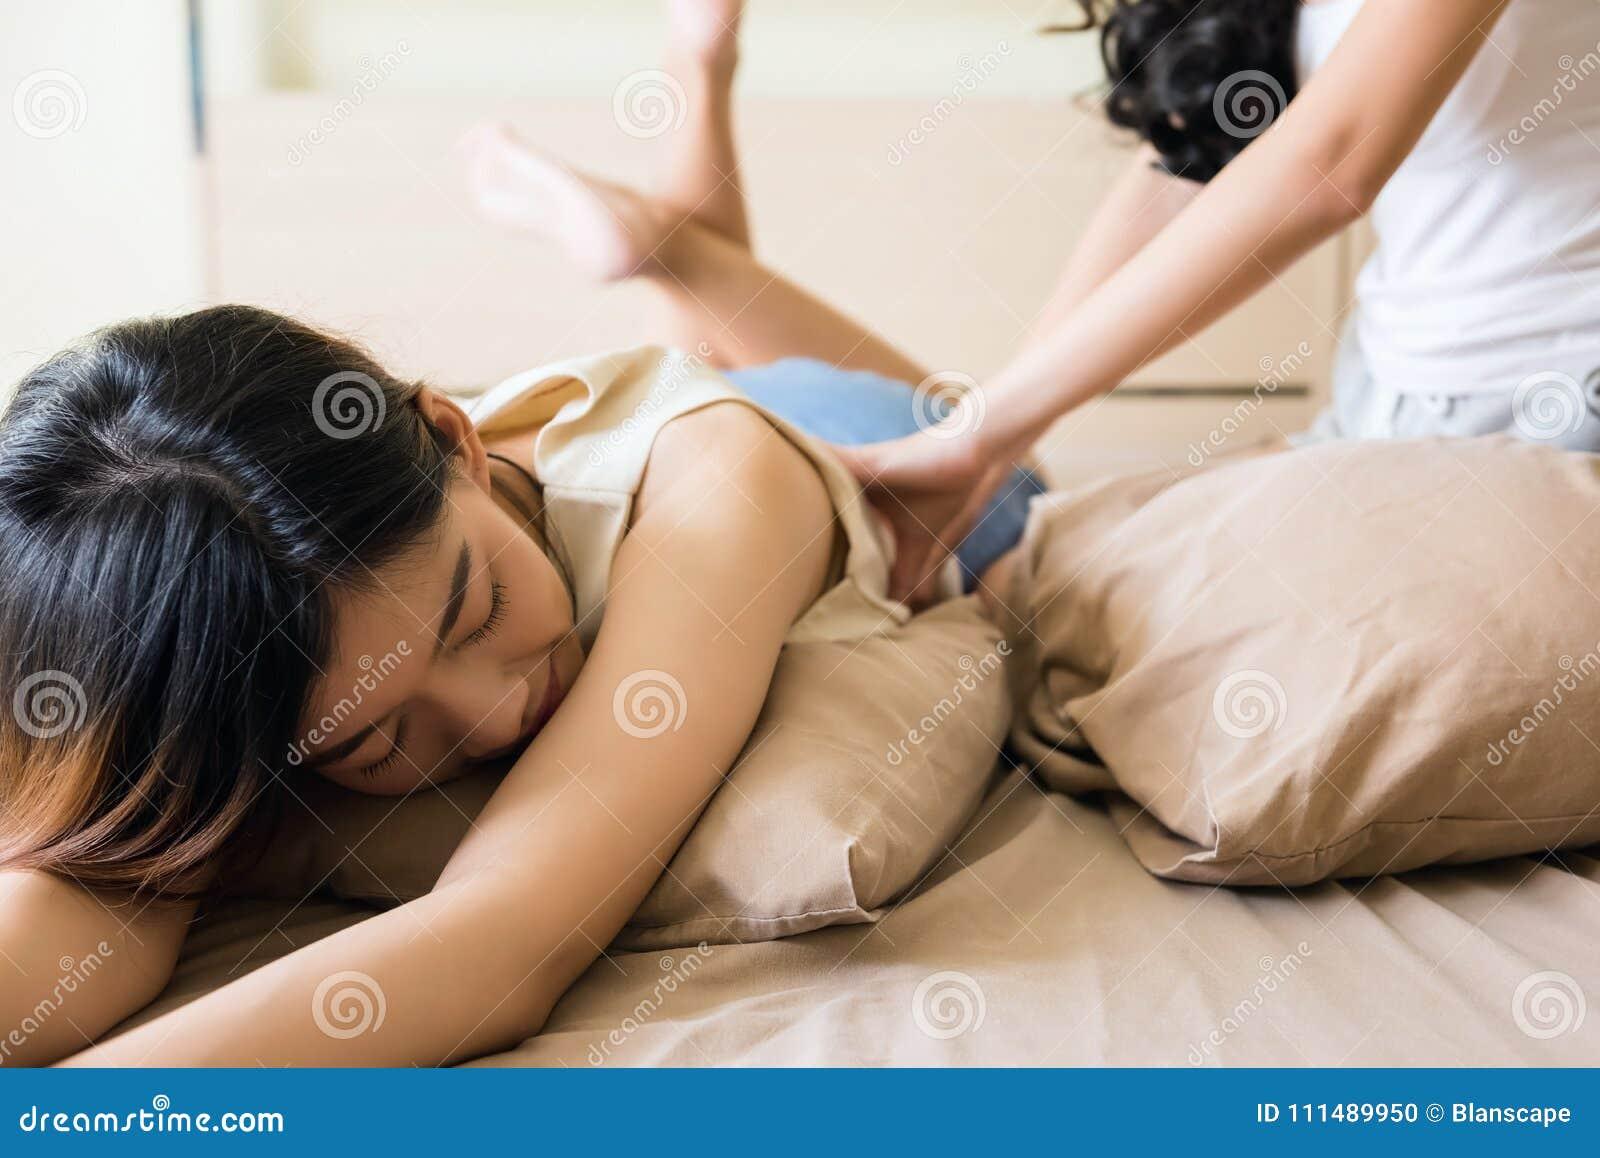 getting massage a lesbians